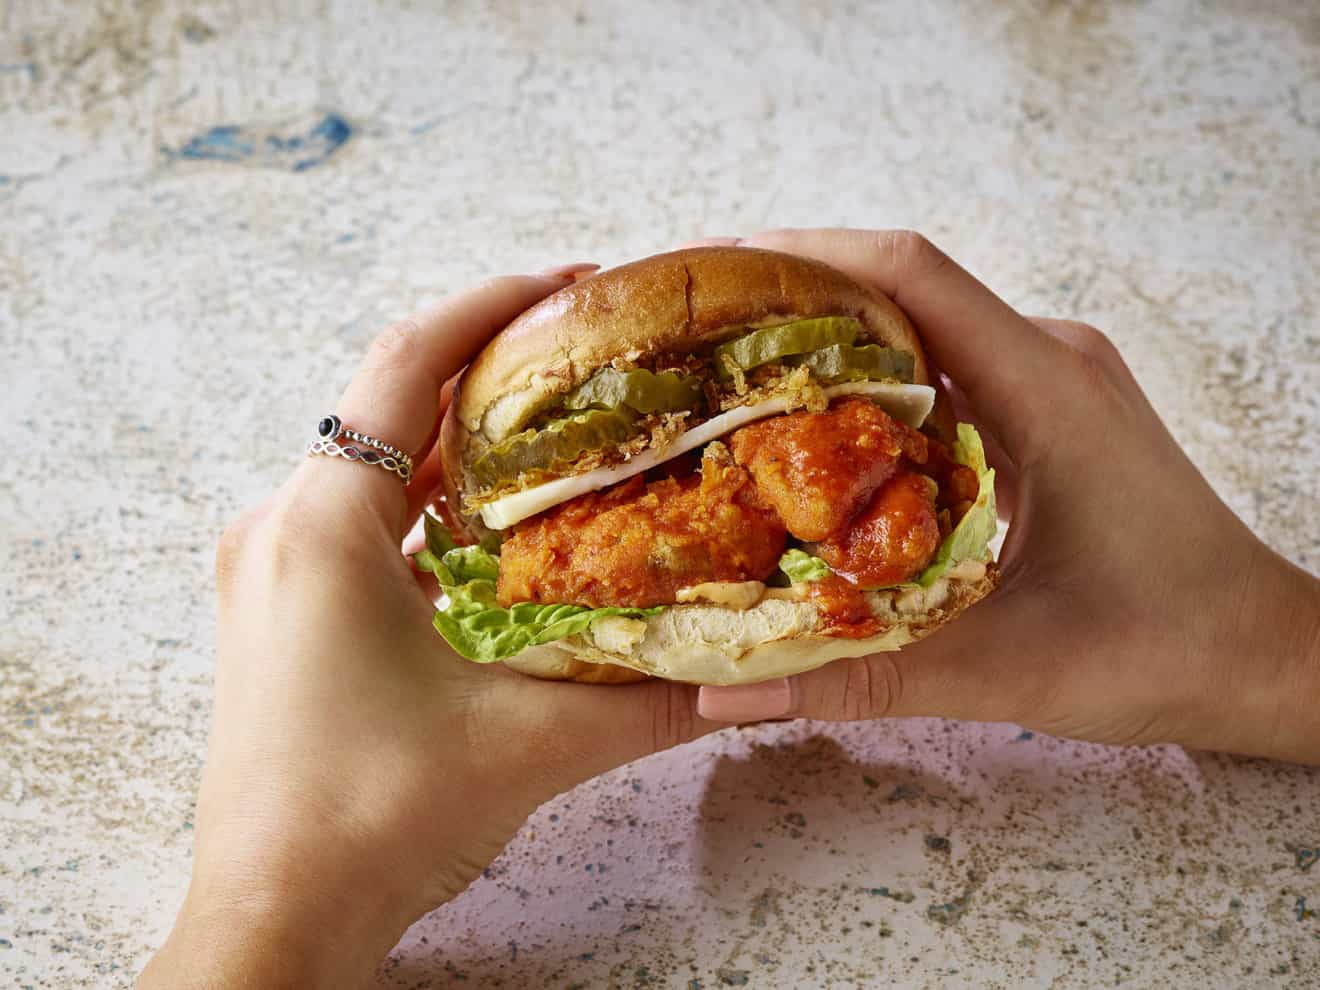 Buffalo Burger The Vurger